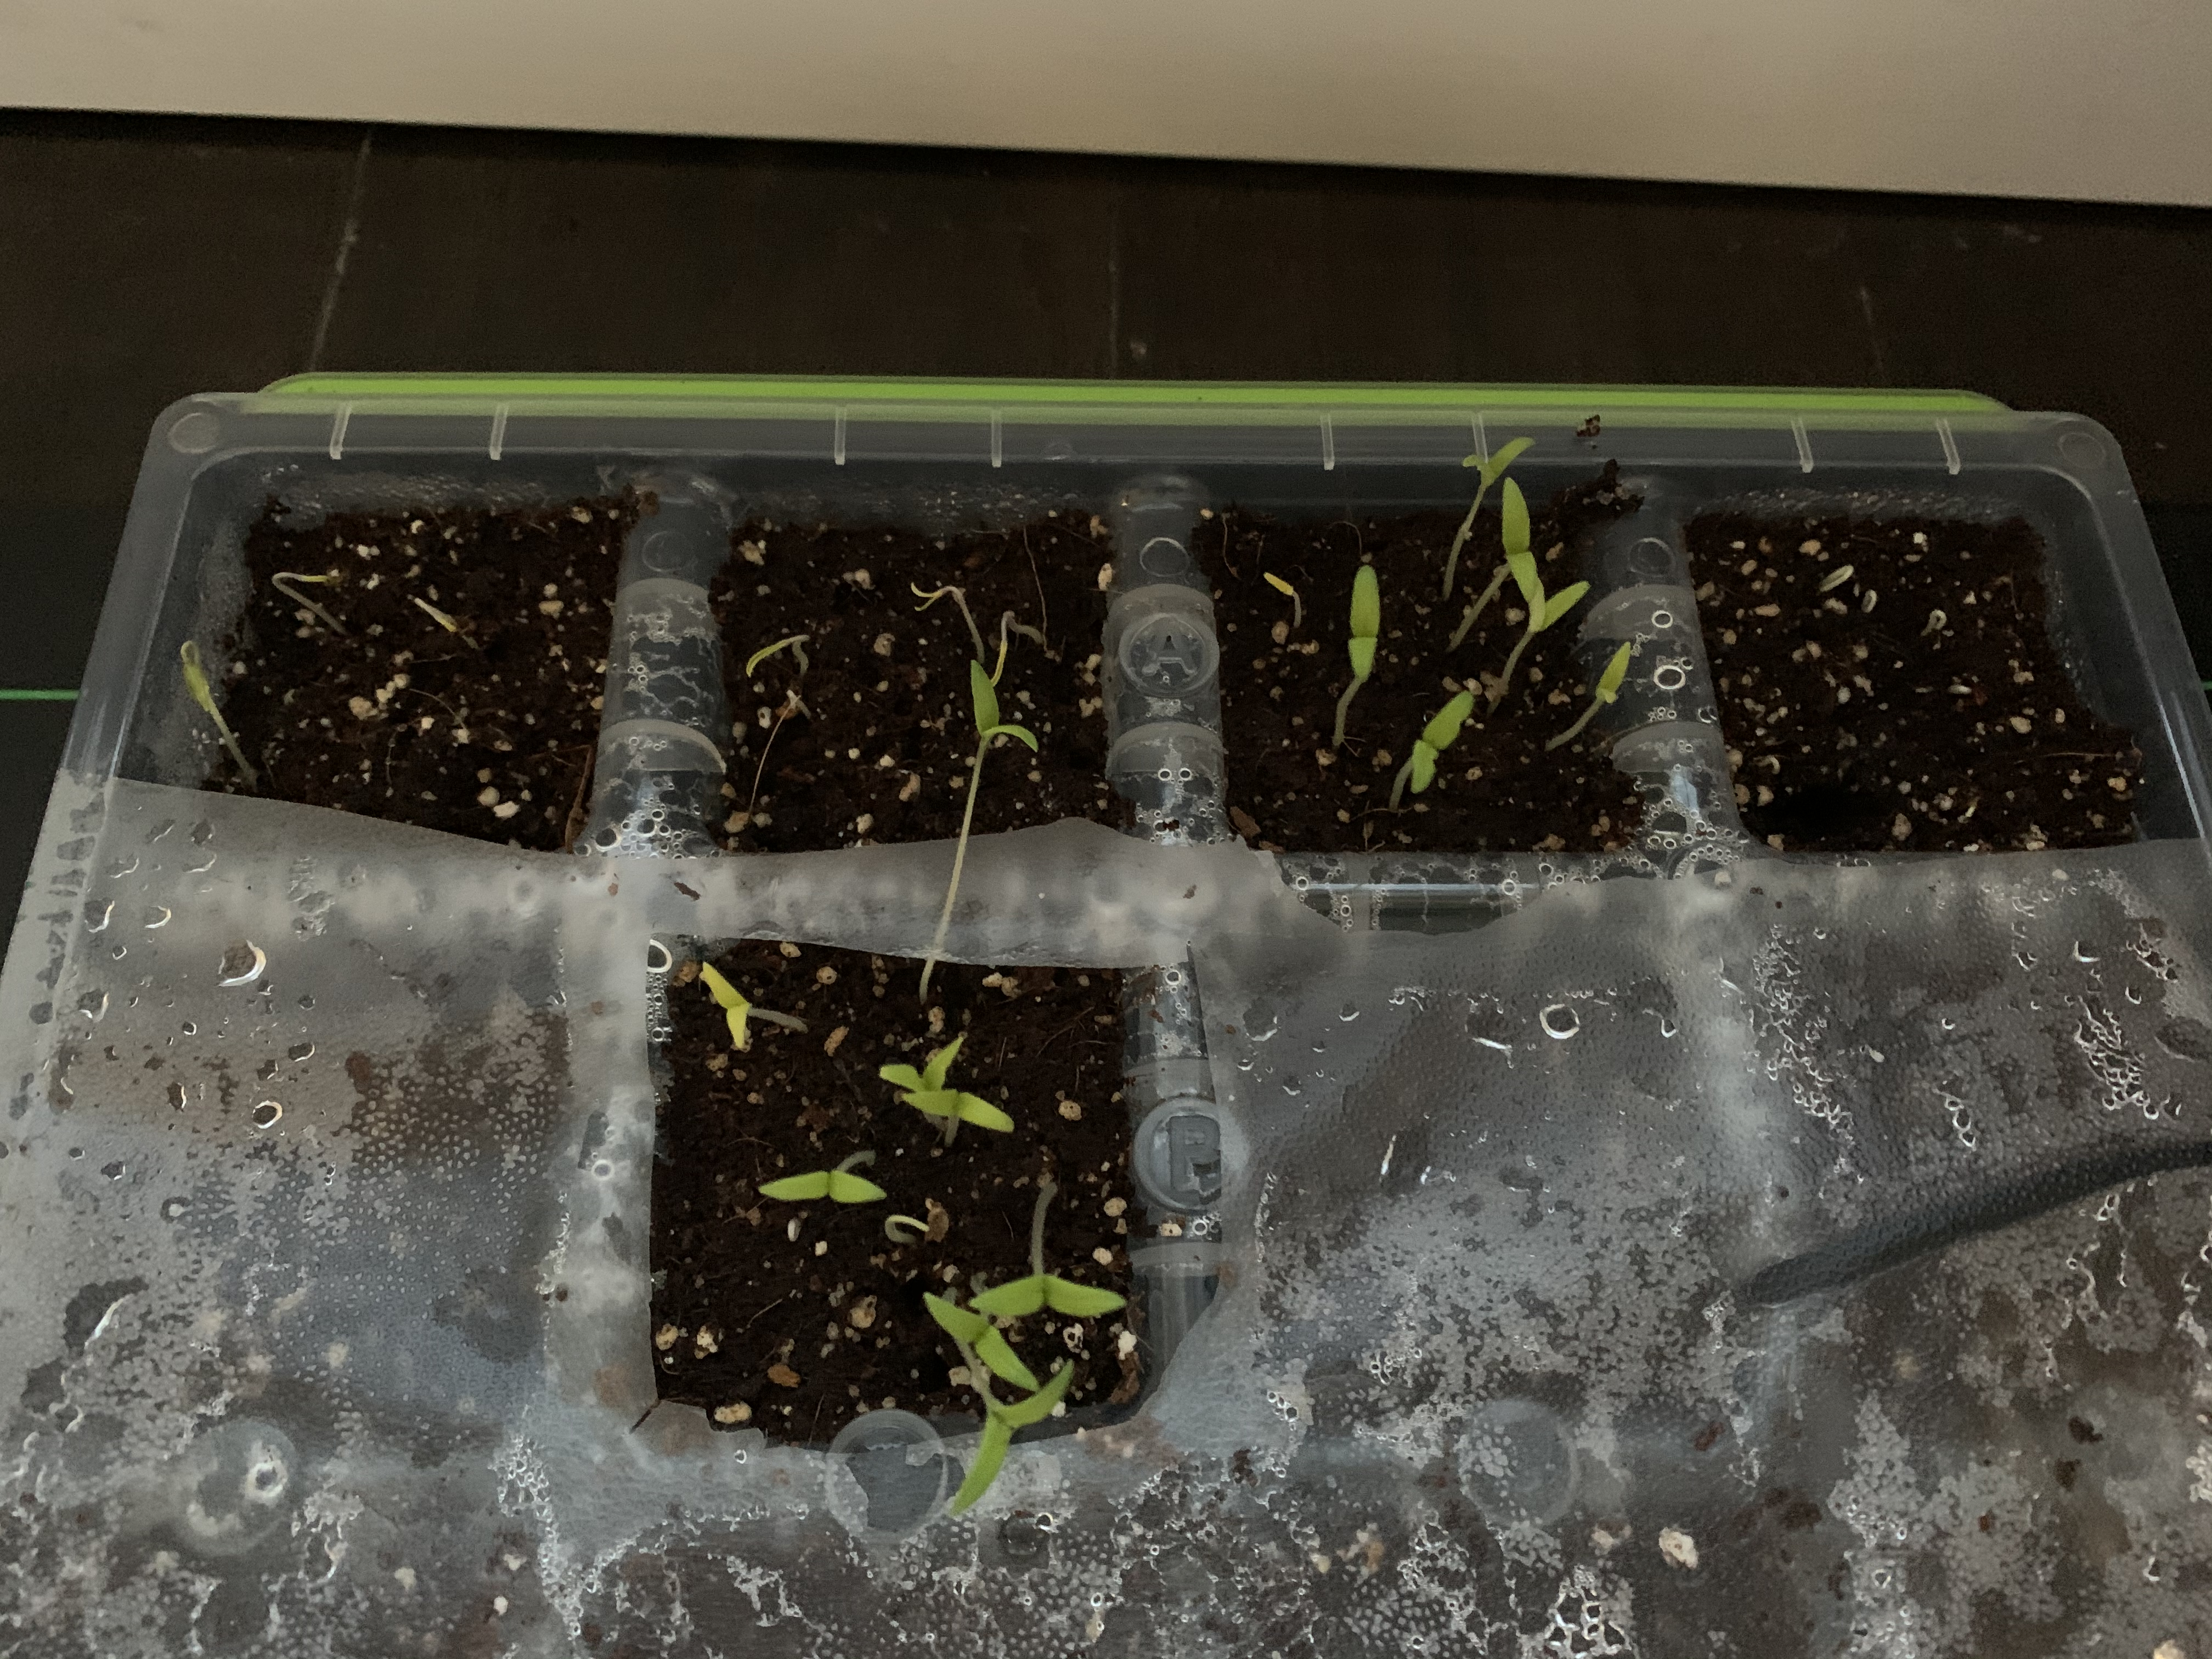 98785B25 93BA 444A 941A F23FA5B6999F Seedlings Day 5